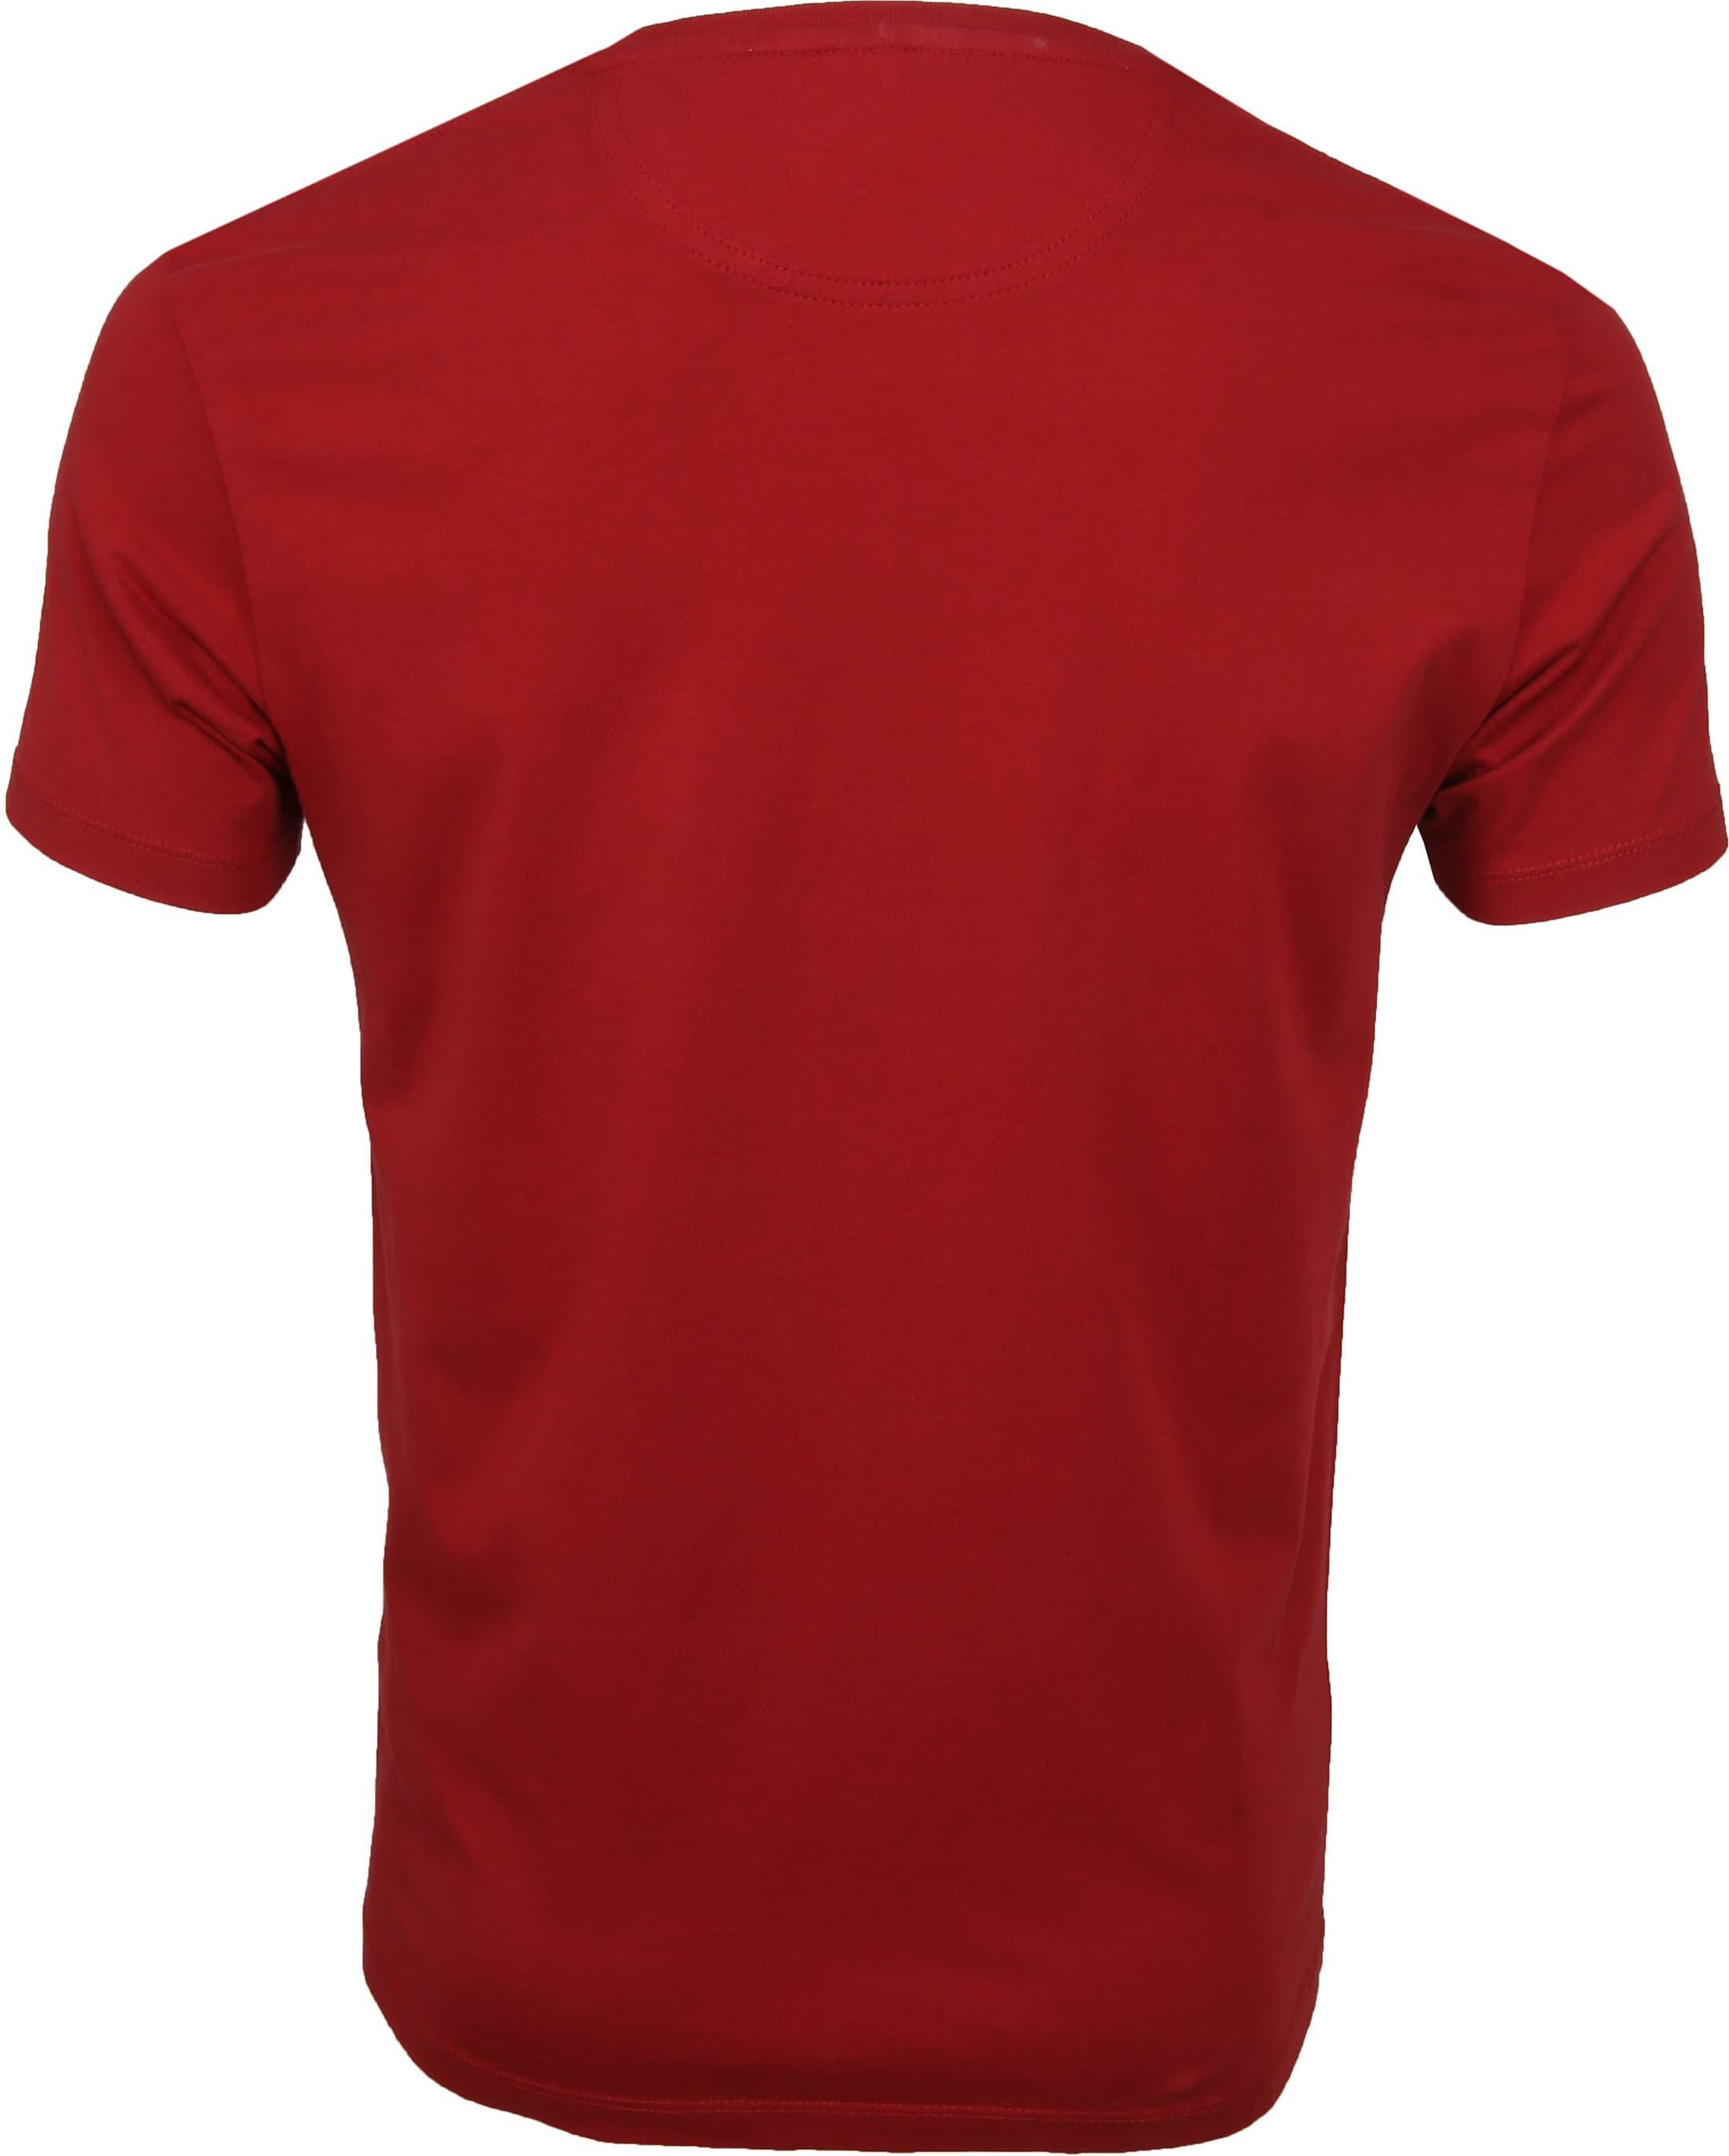 Timberland Dunstan T-shirt Rood foto 2